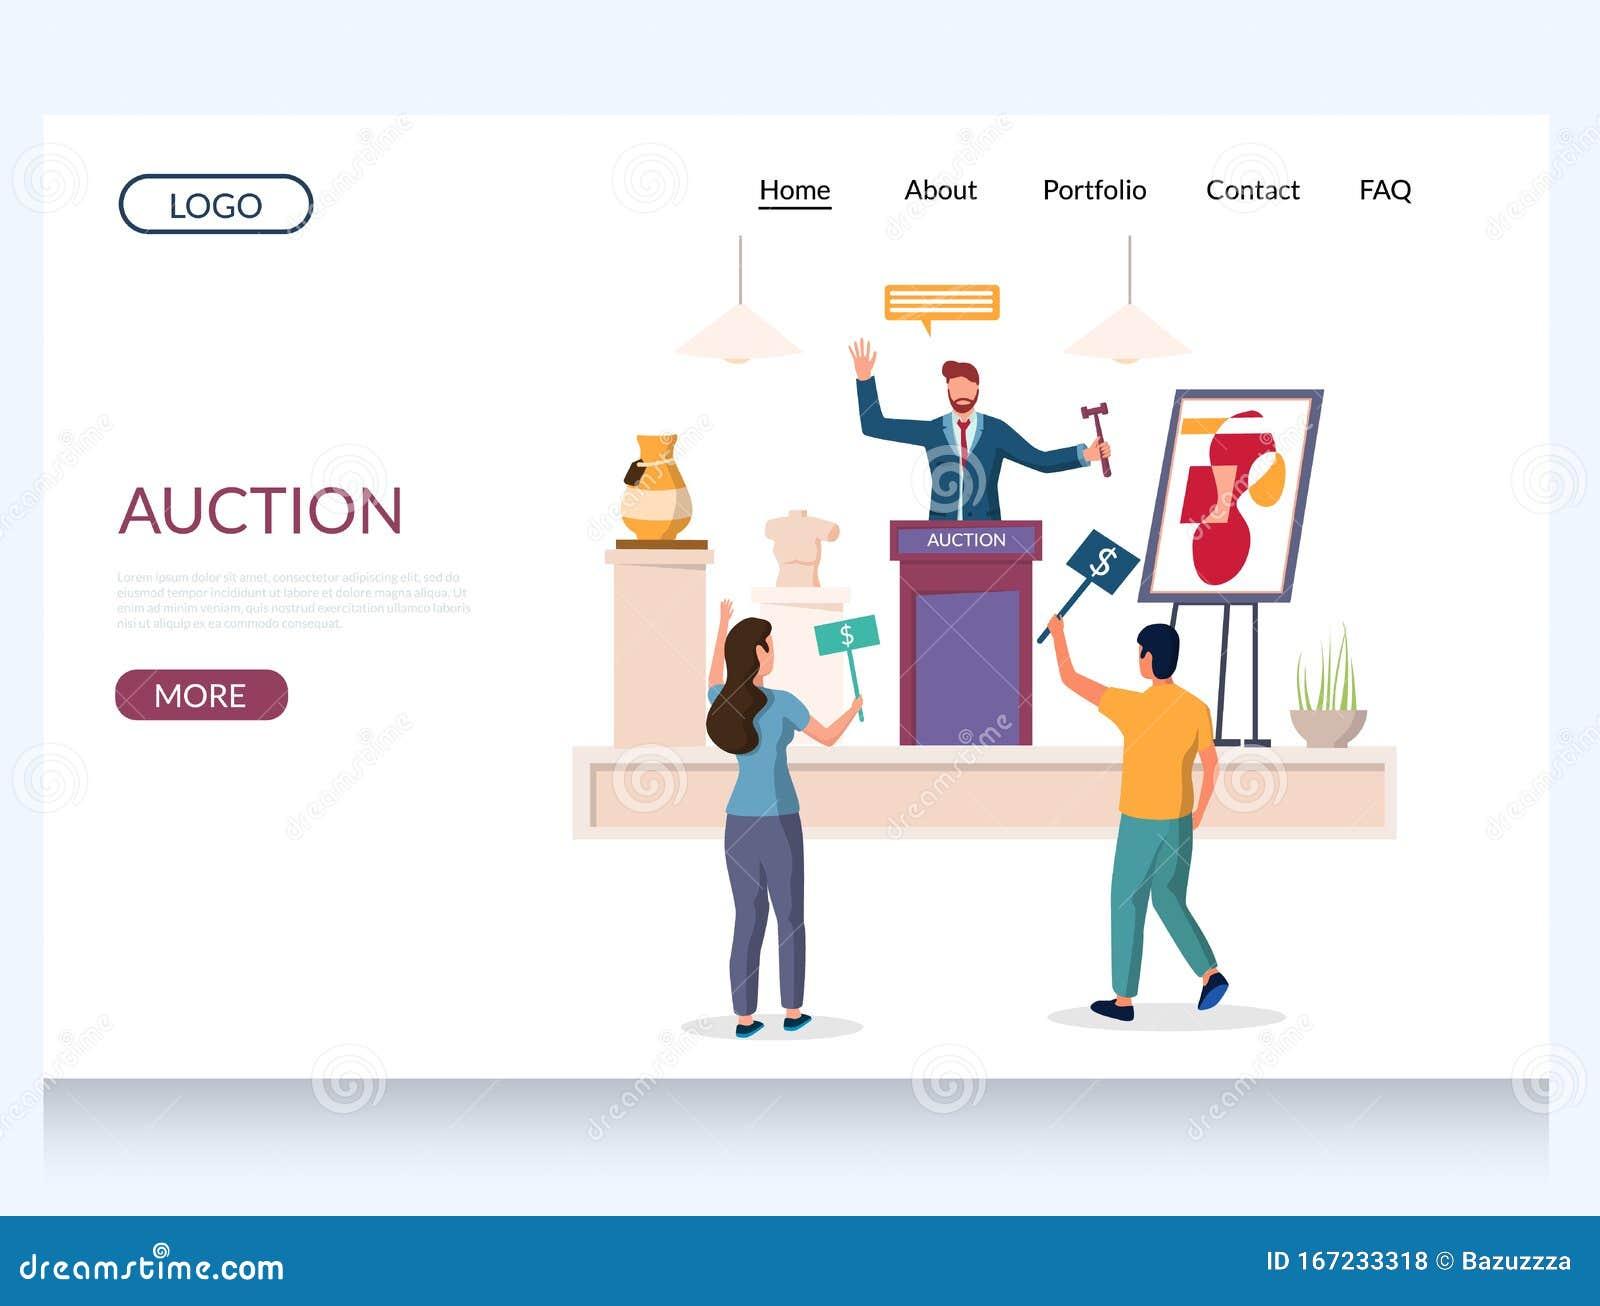 Auction Vector Website Landing Page Design Template Stock Vector Illustration Of Bidding Hands 167233318